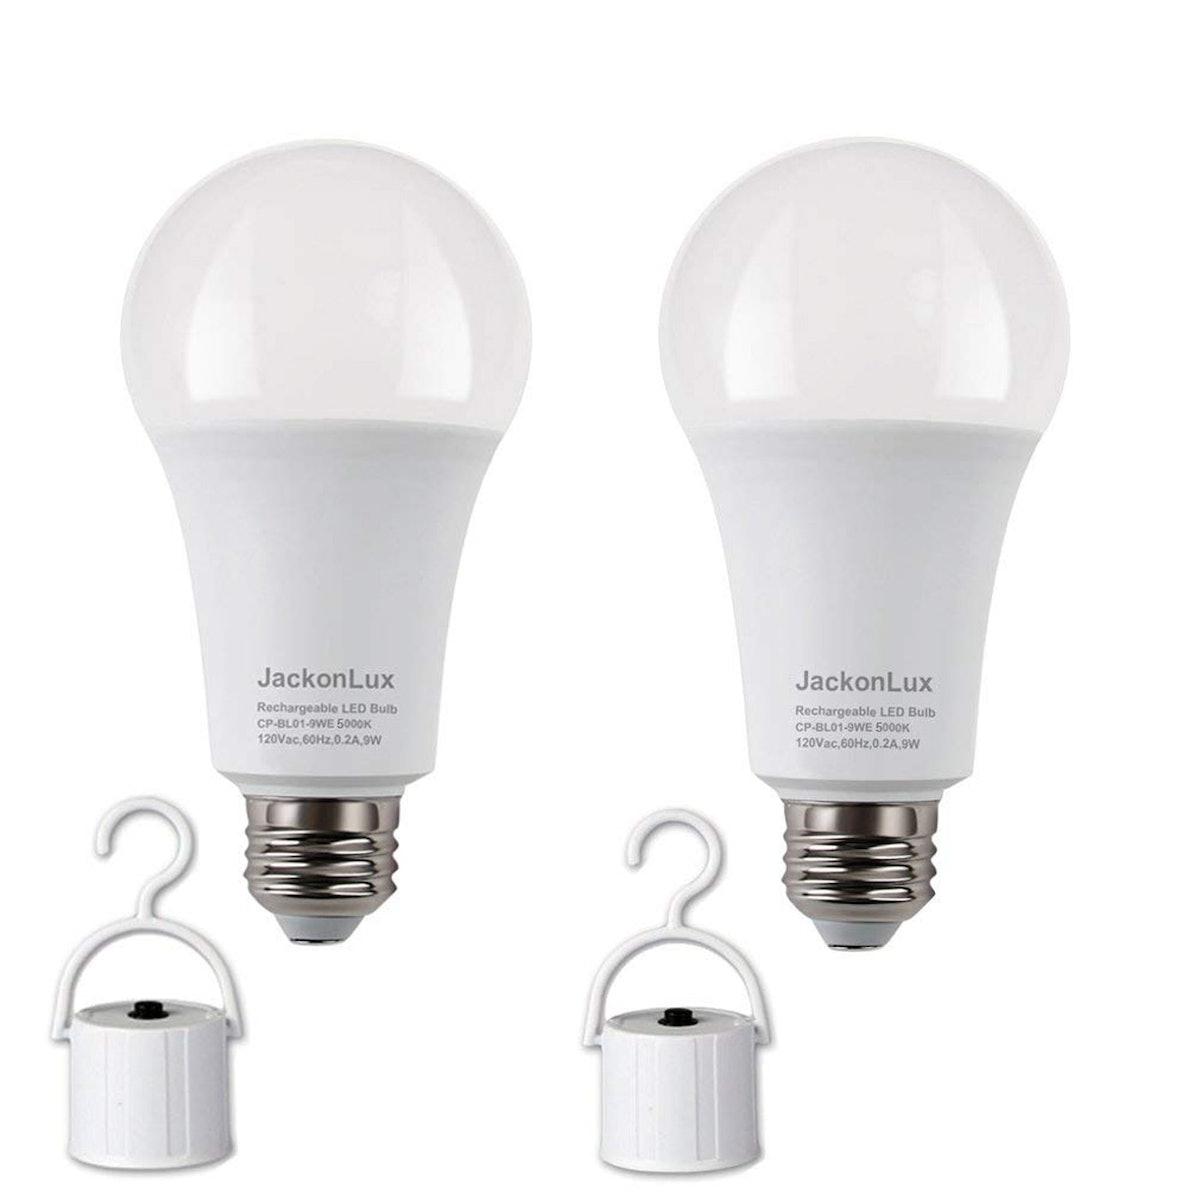 JackonLux Rechargeable LED Bulb (2 Pack)